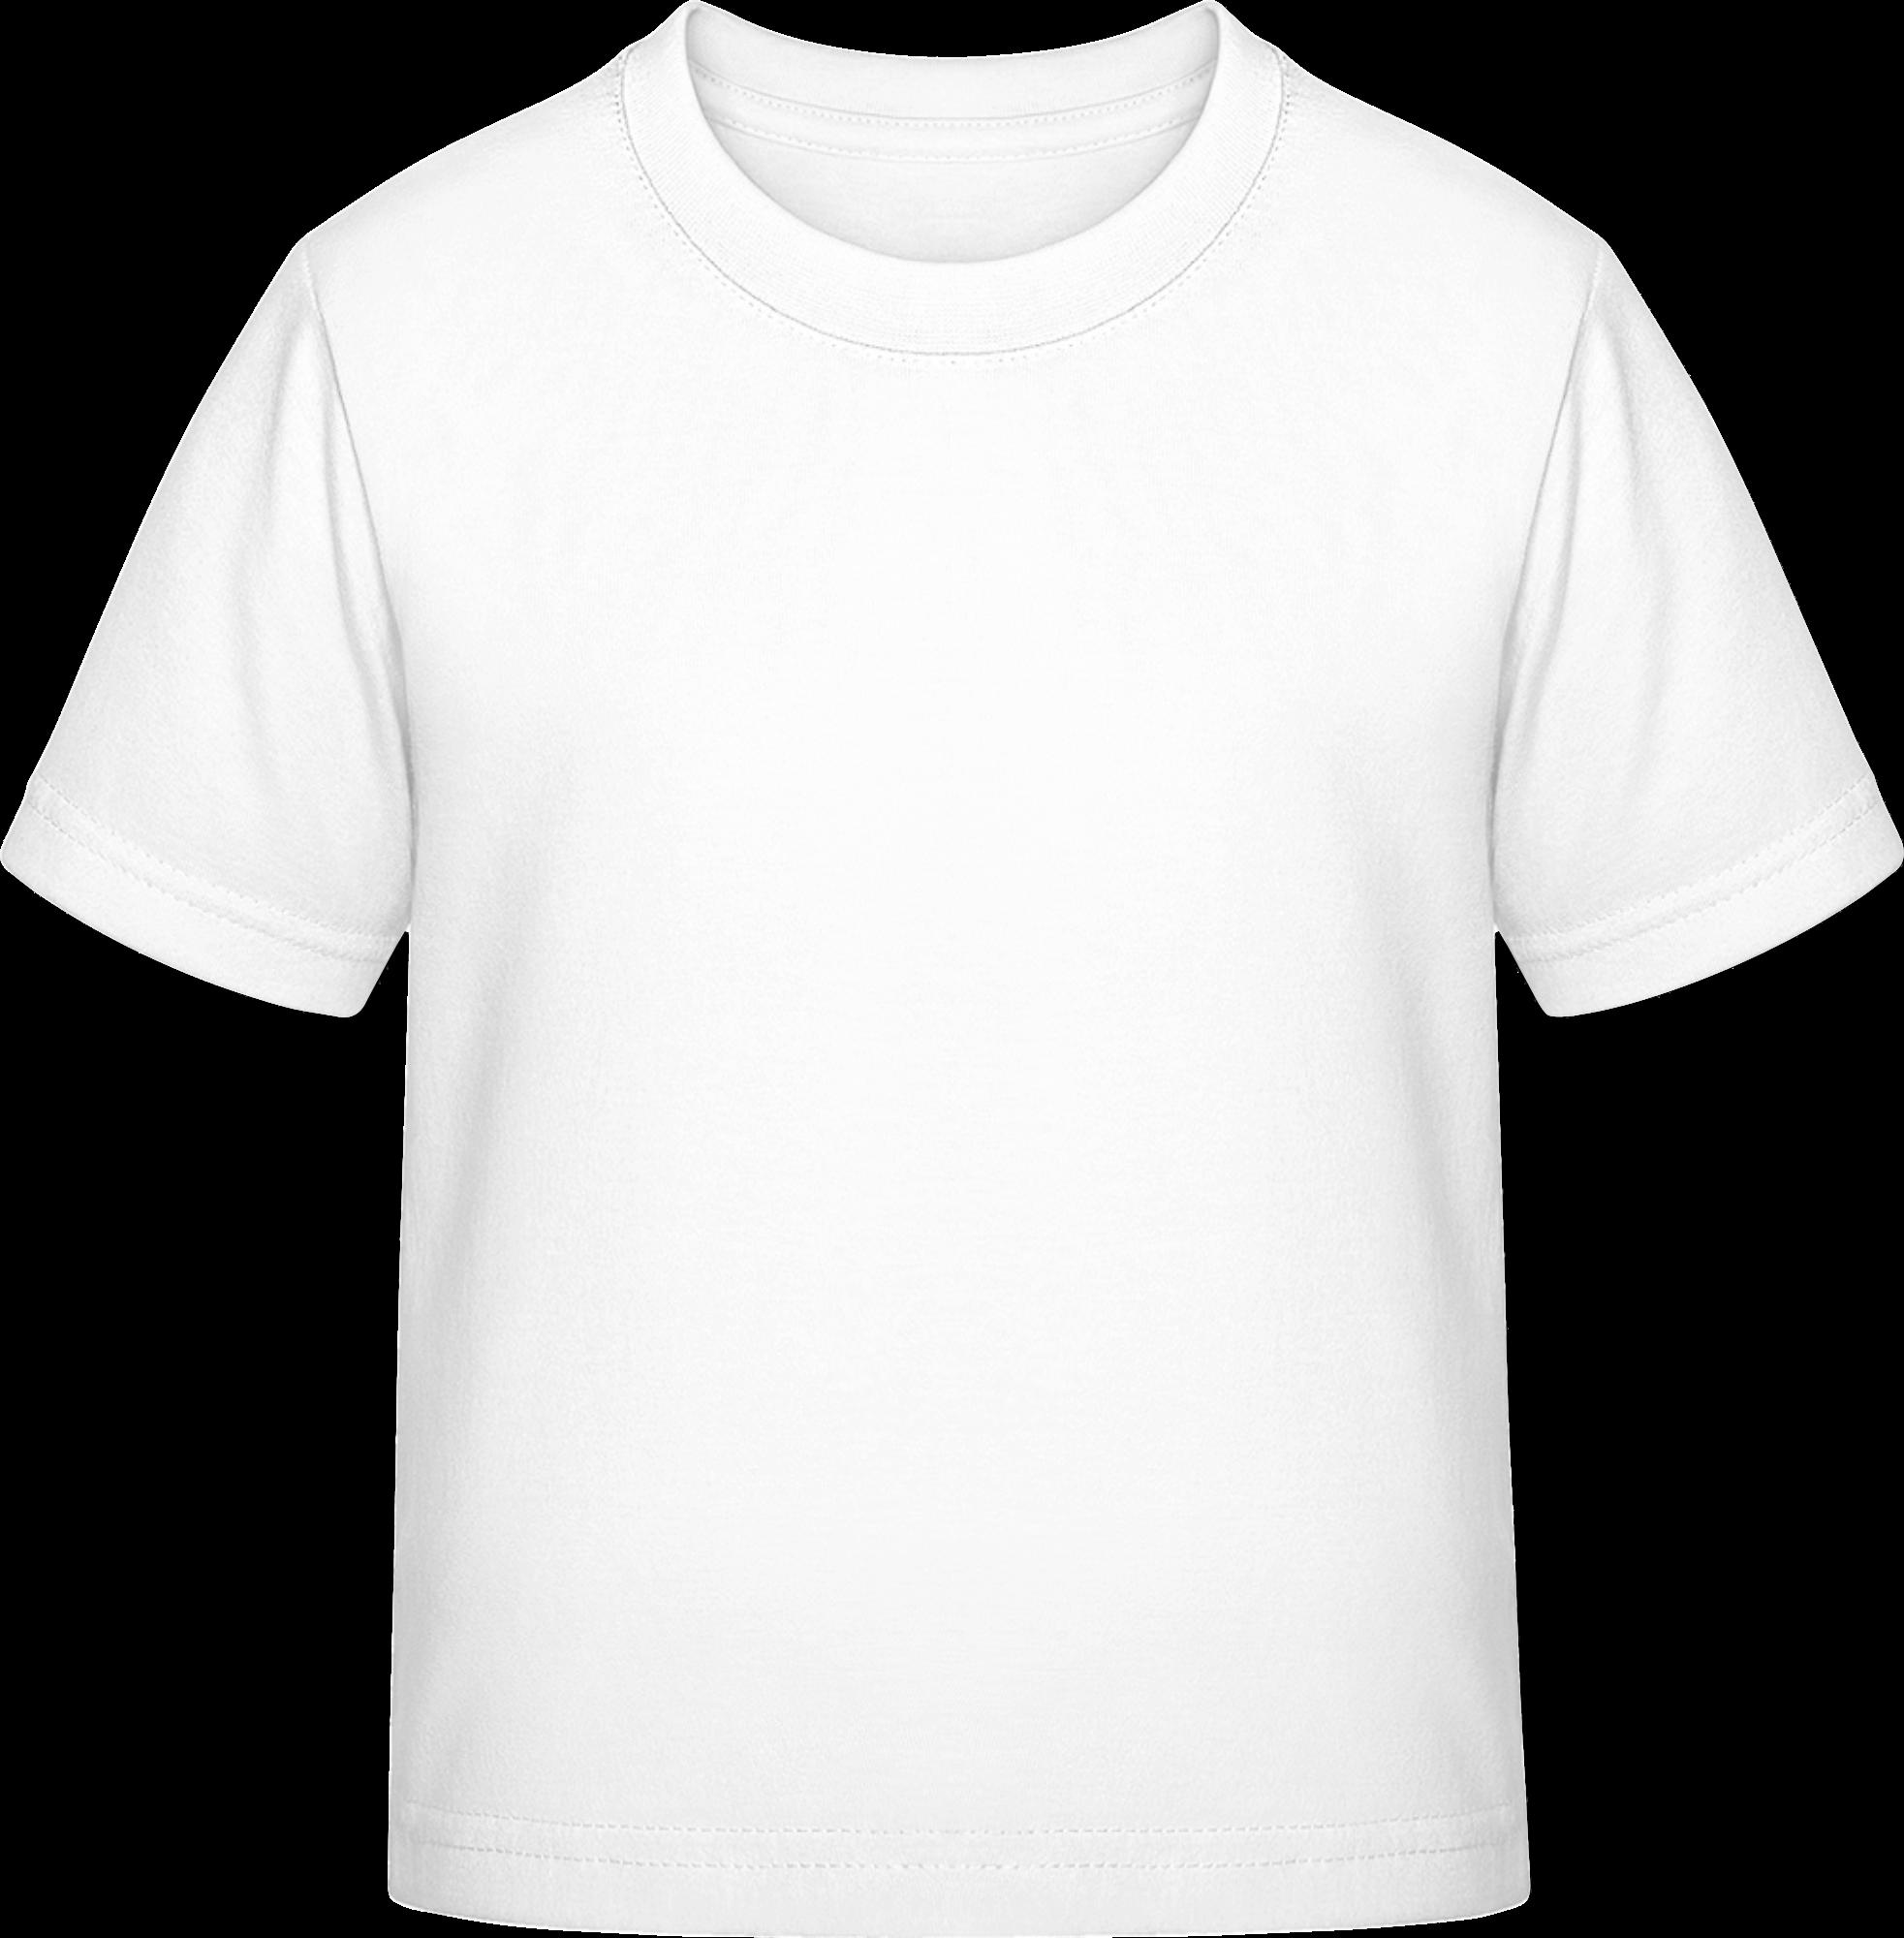 Weiß Kinder T-shirt